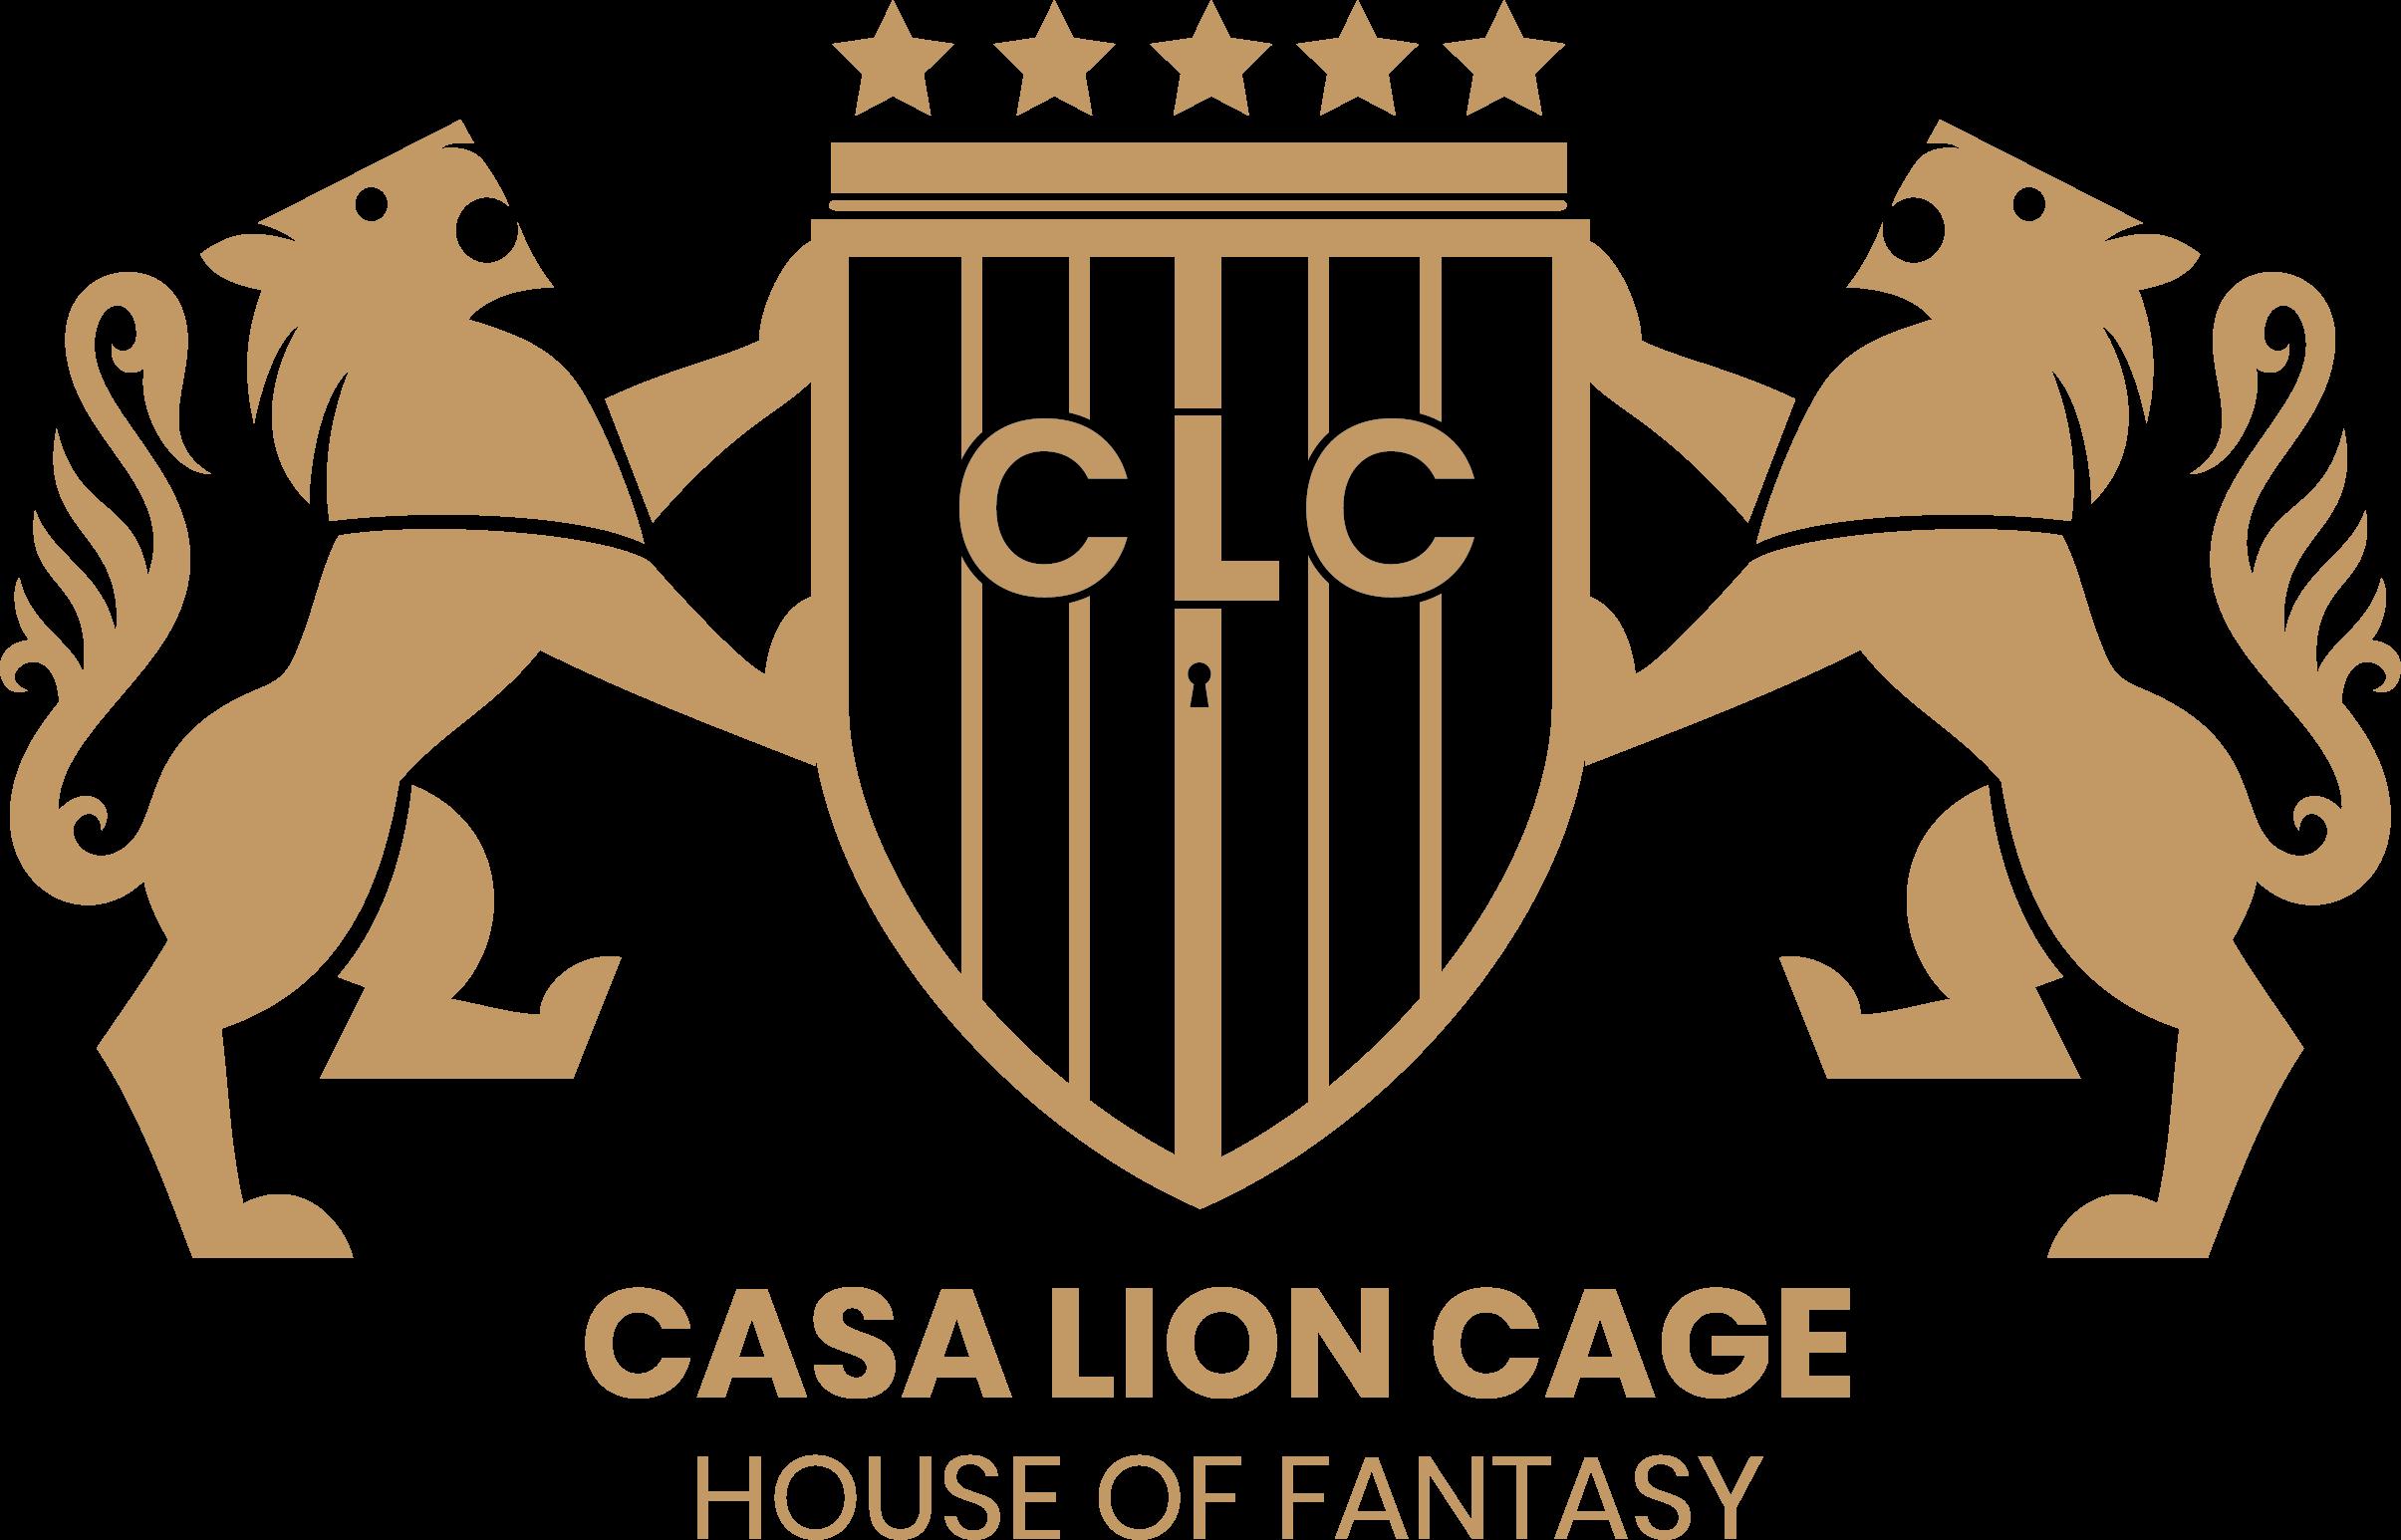 Casa Lion Cage – House of Fantasy